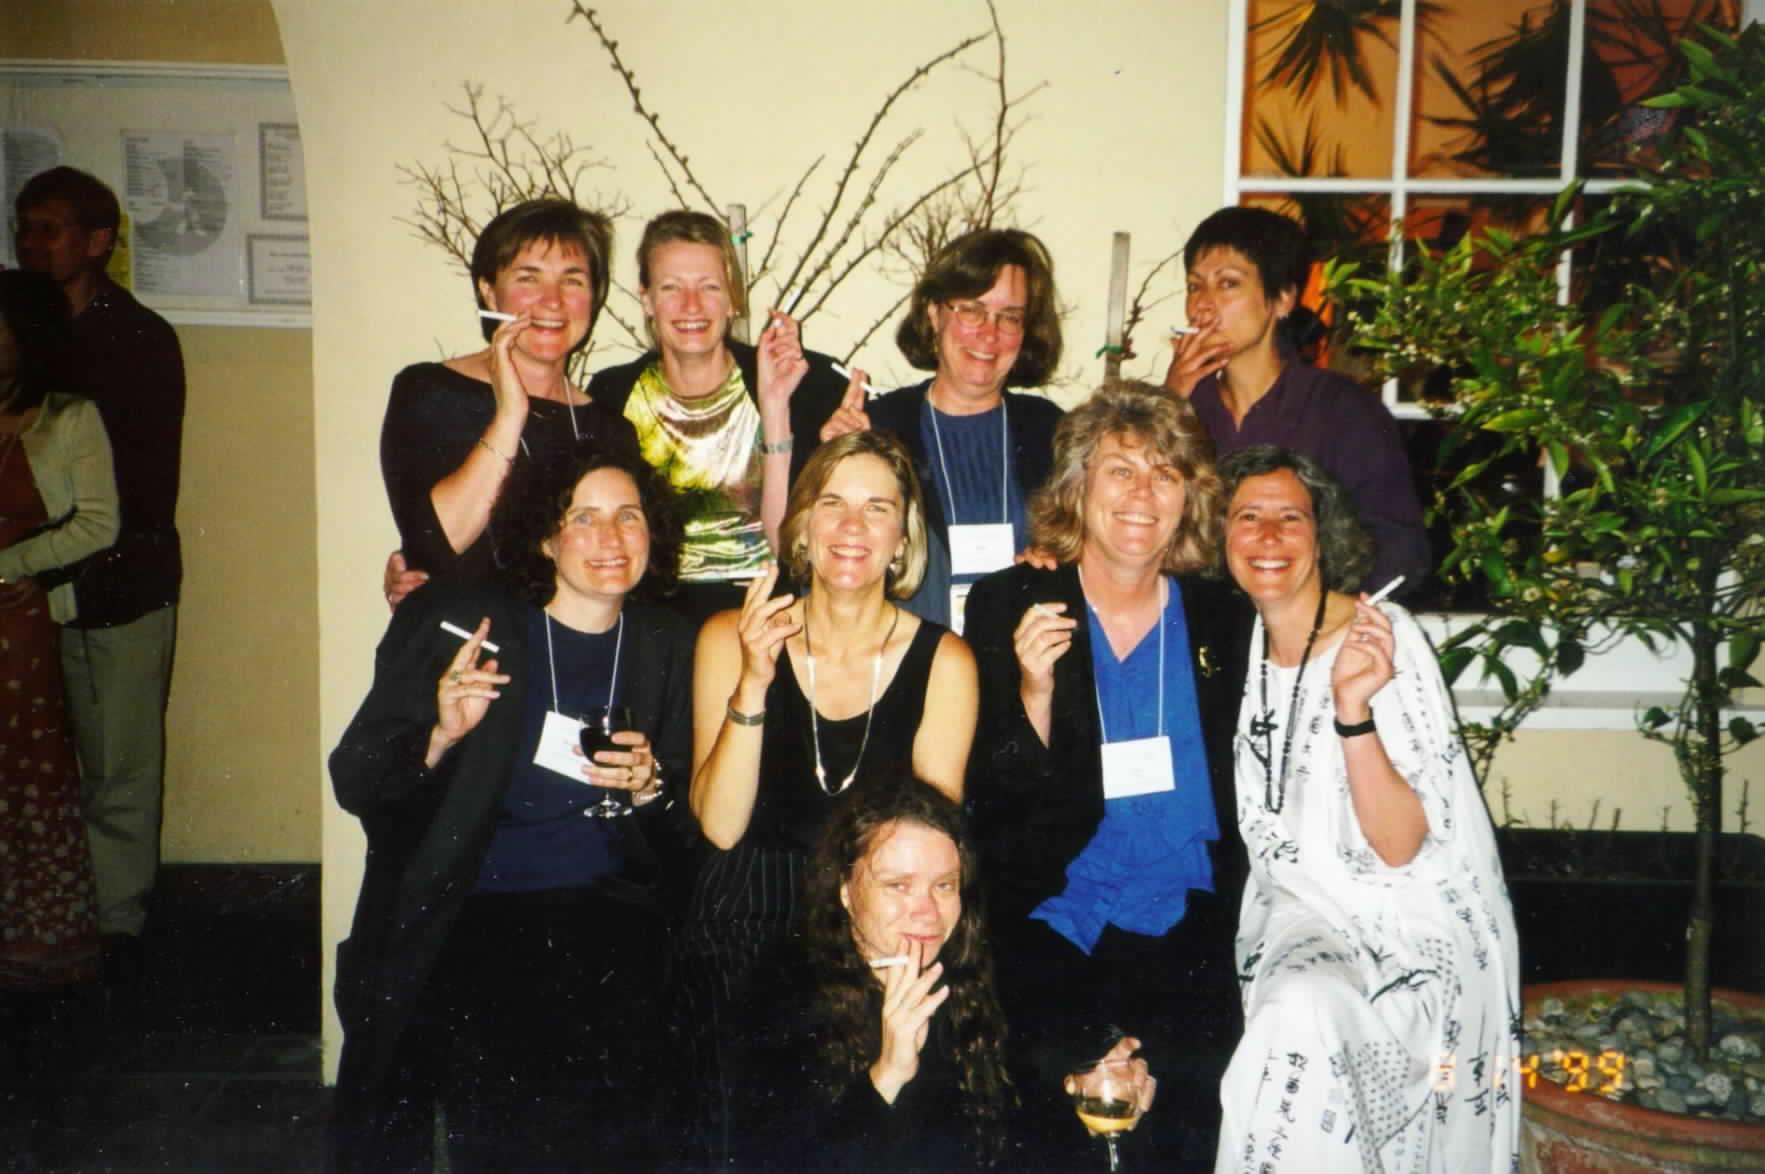 http://www.workpractice.com/wpt-fest/3.3_party/girls_smoking.jpg